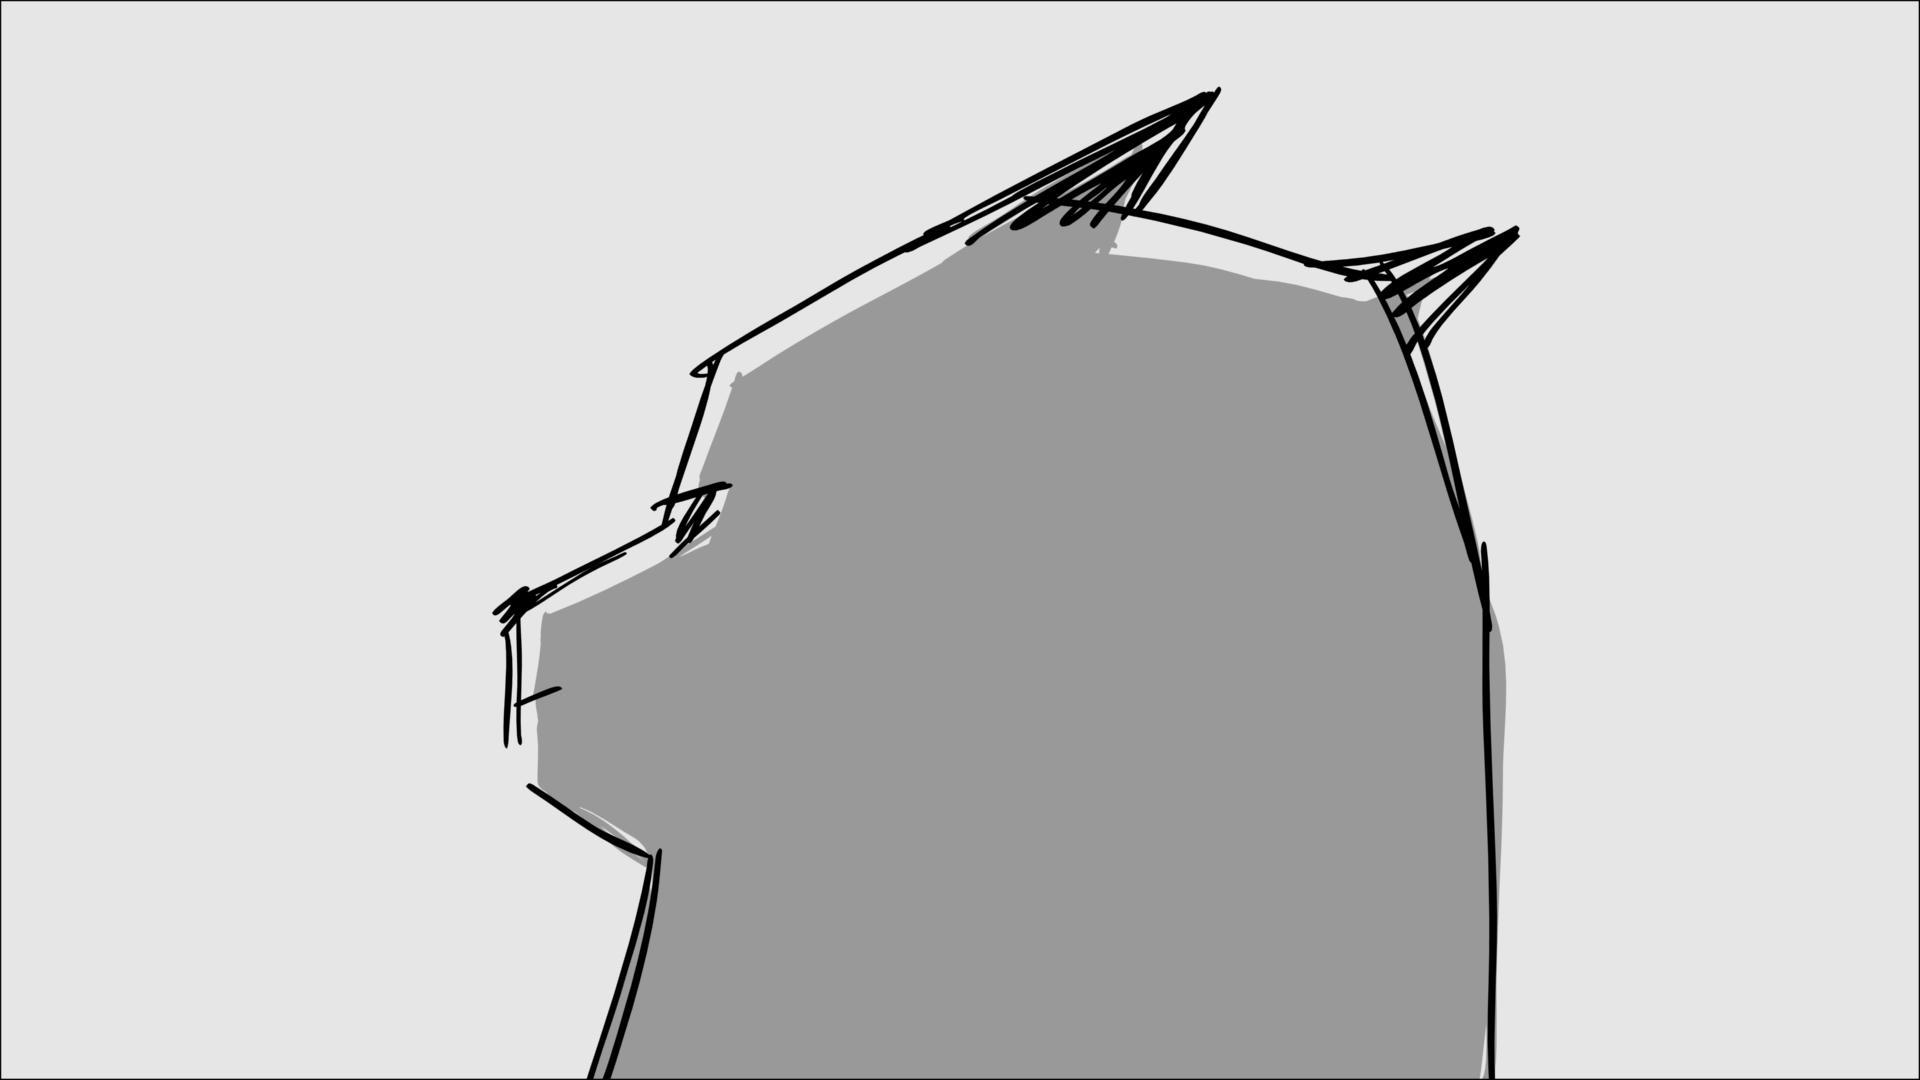 Blades of Furry-000024-02.jpg